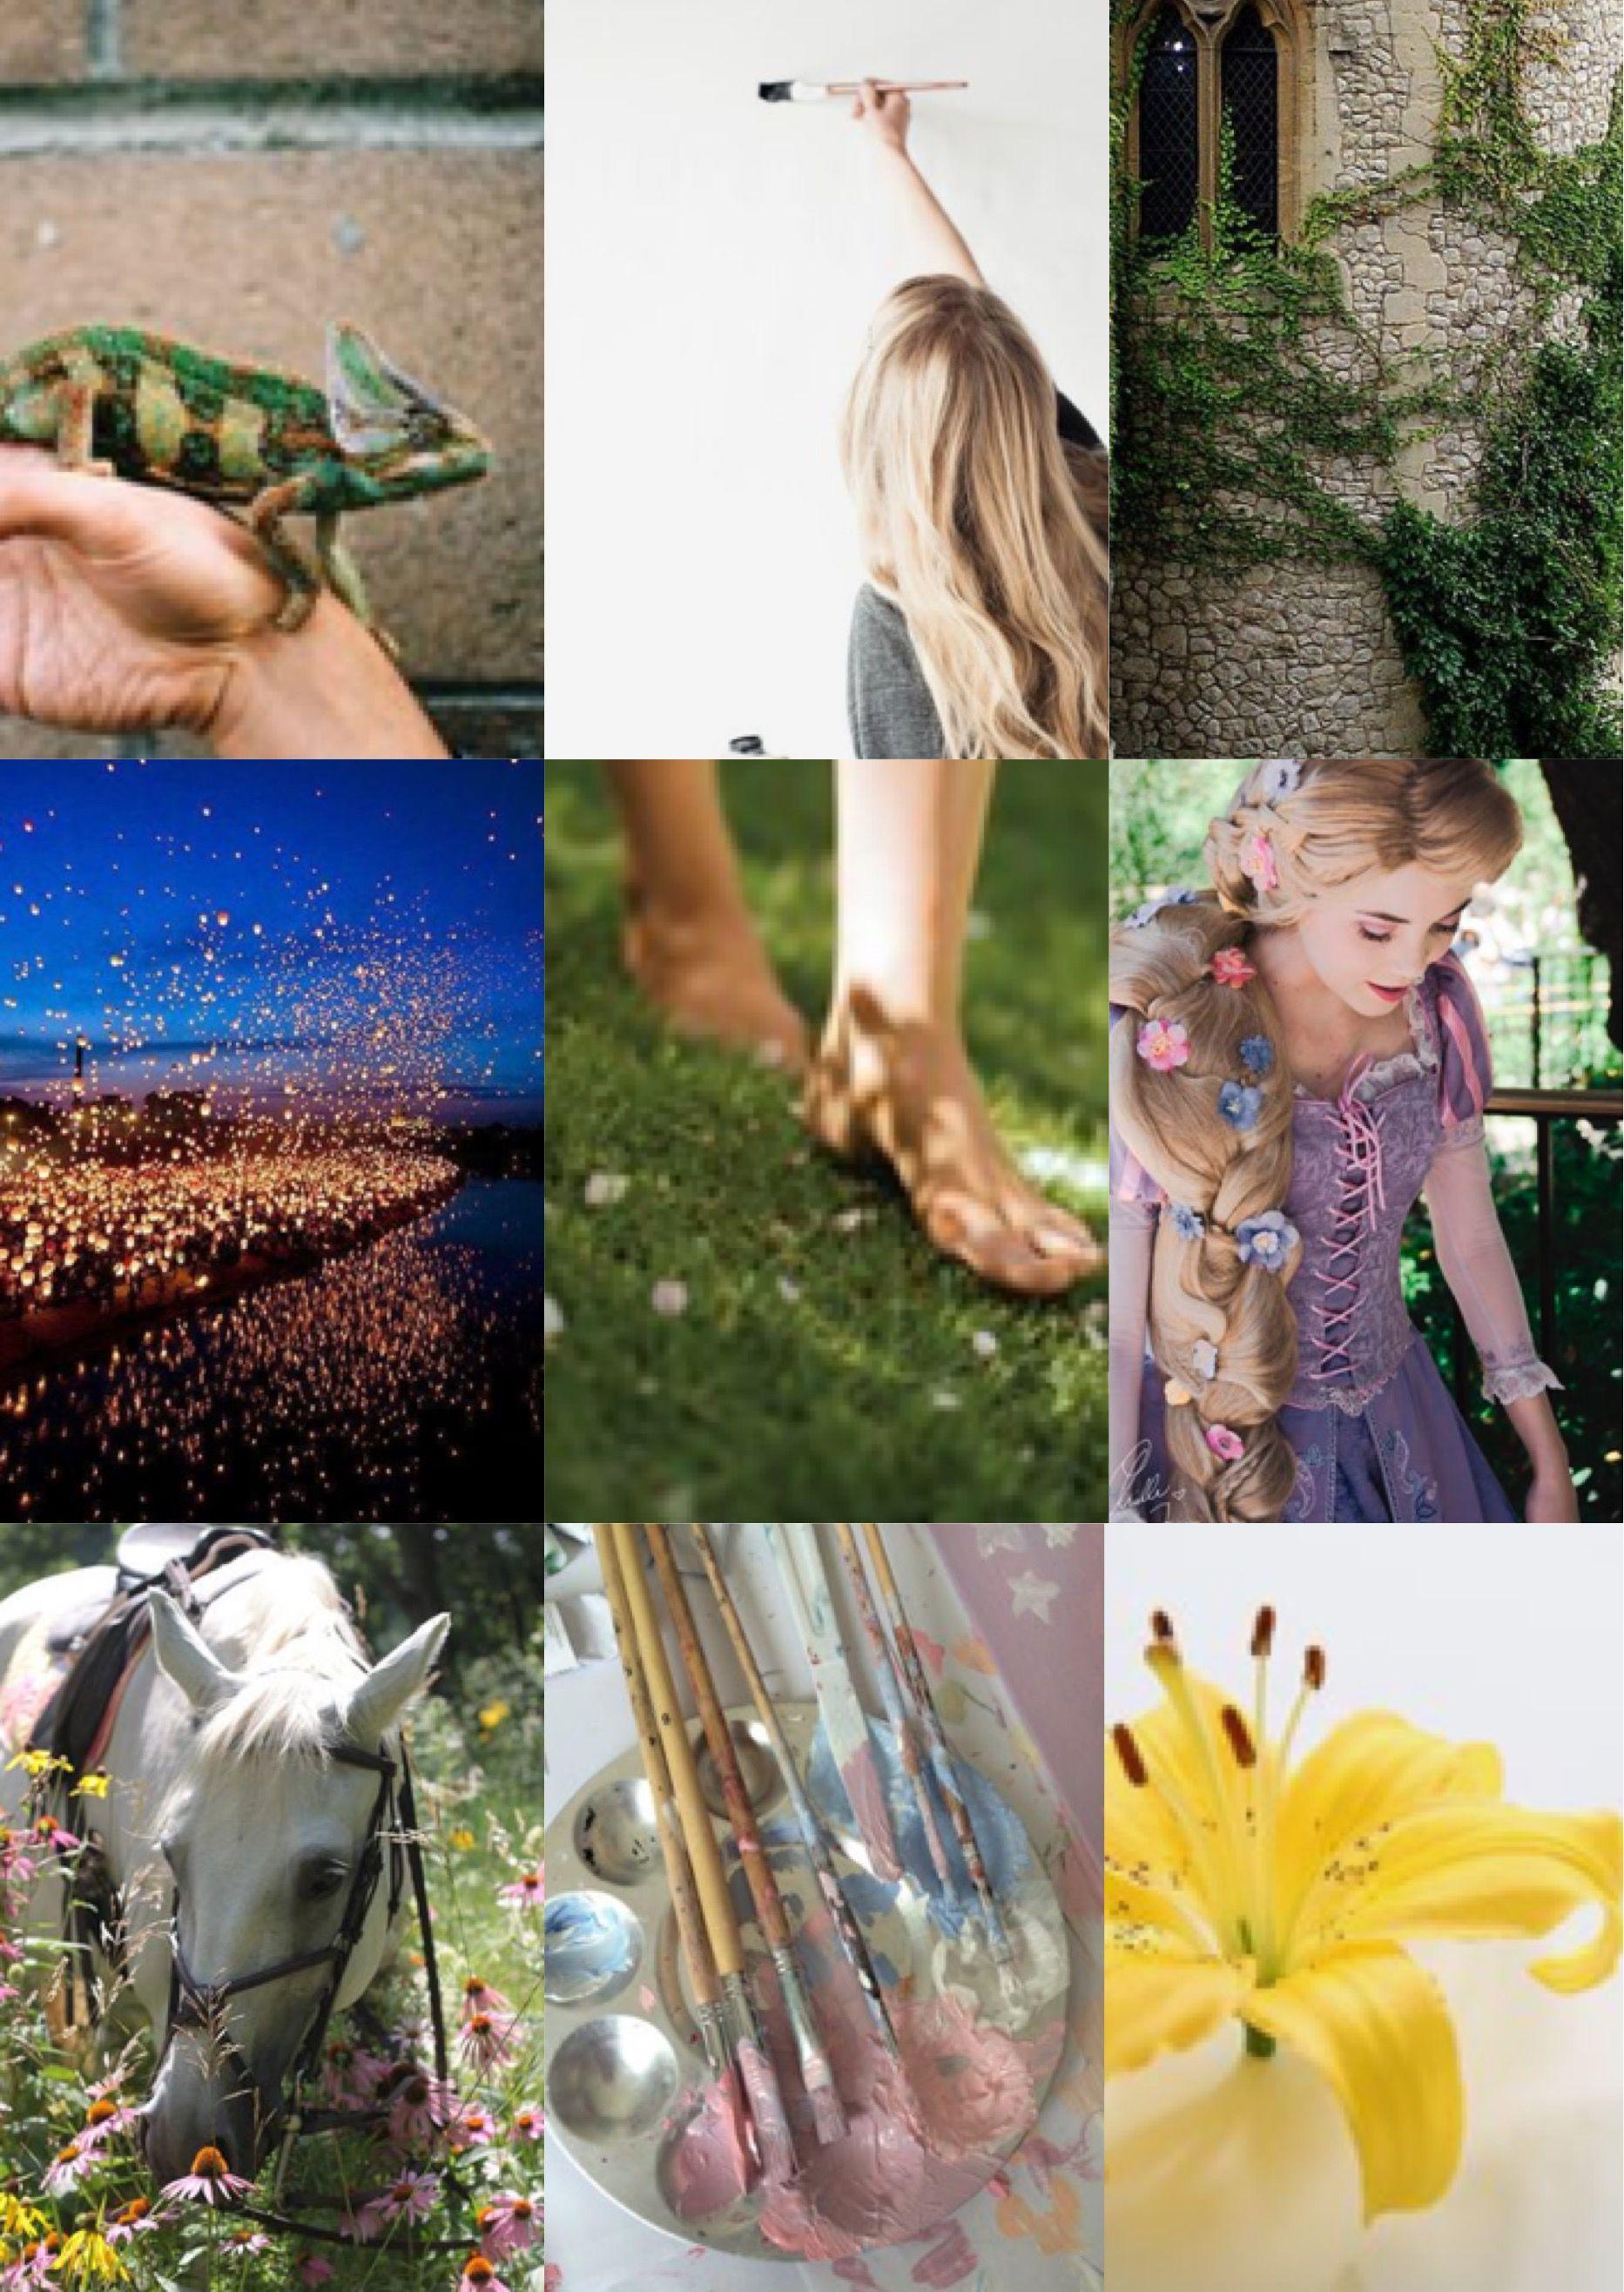 Rapunzel aesthetic inspiration Disney princess, Dance blog